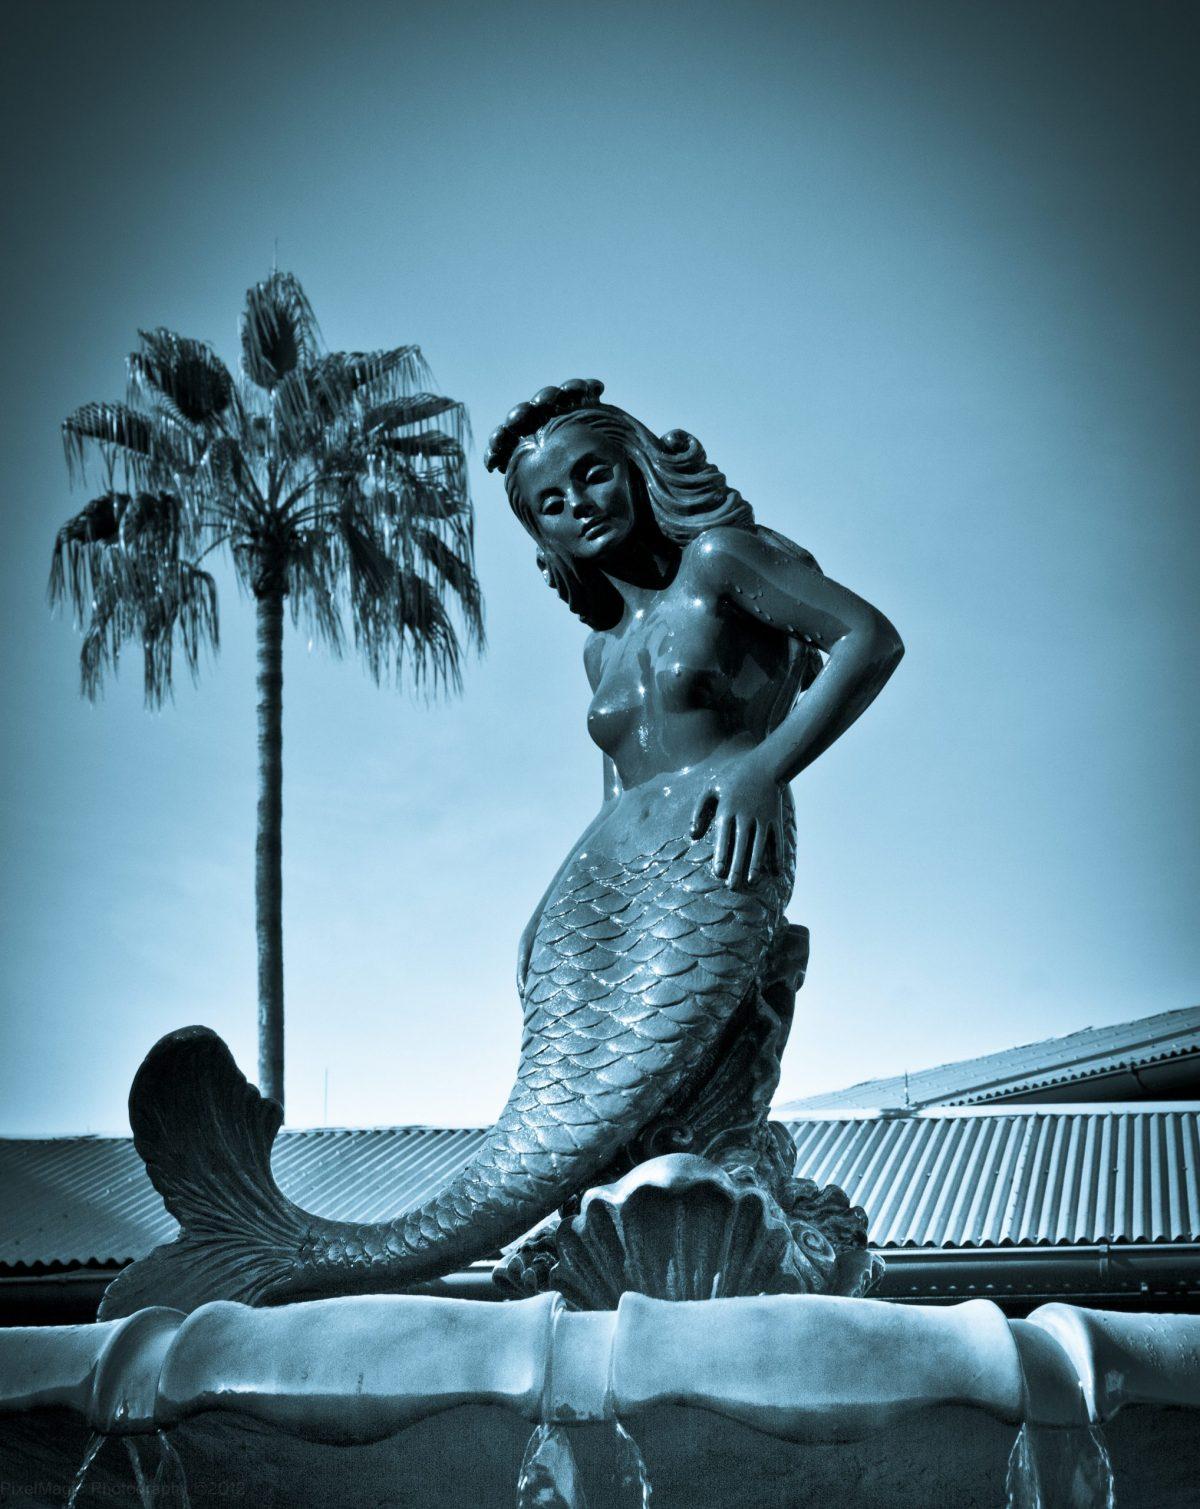 Mermaid Fountain from the Movie Splash